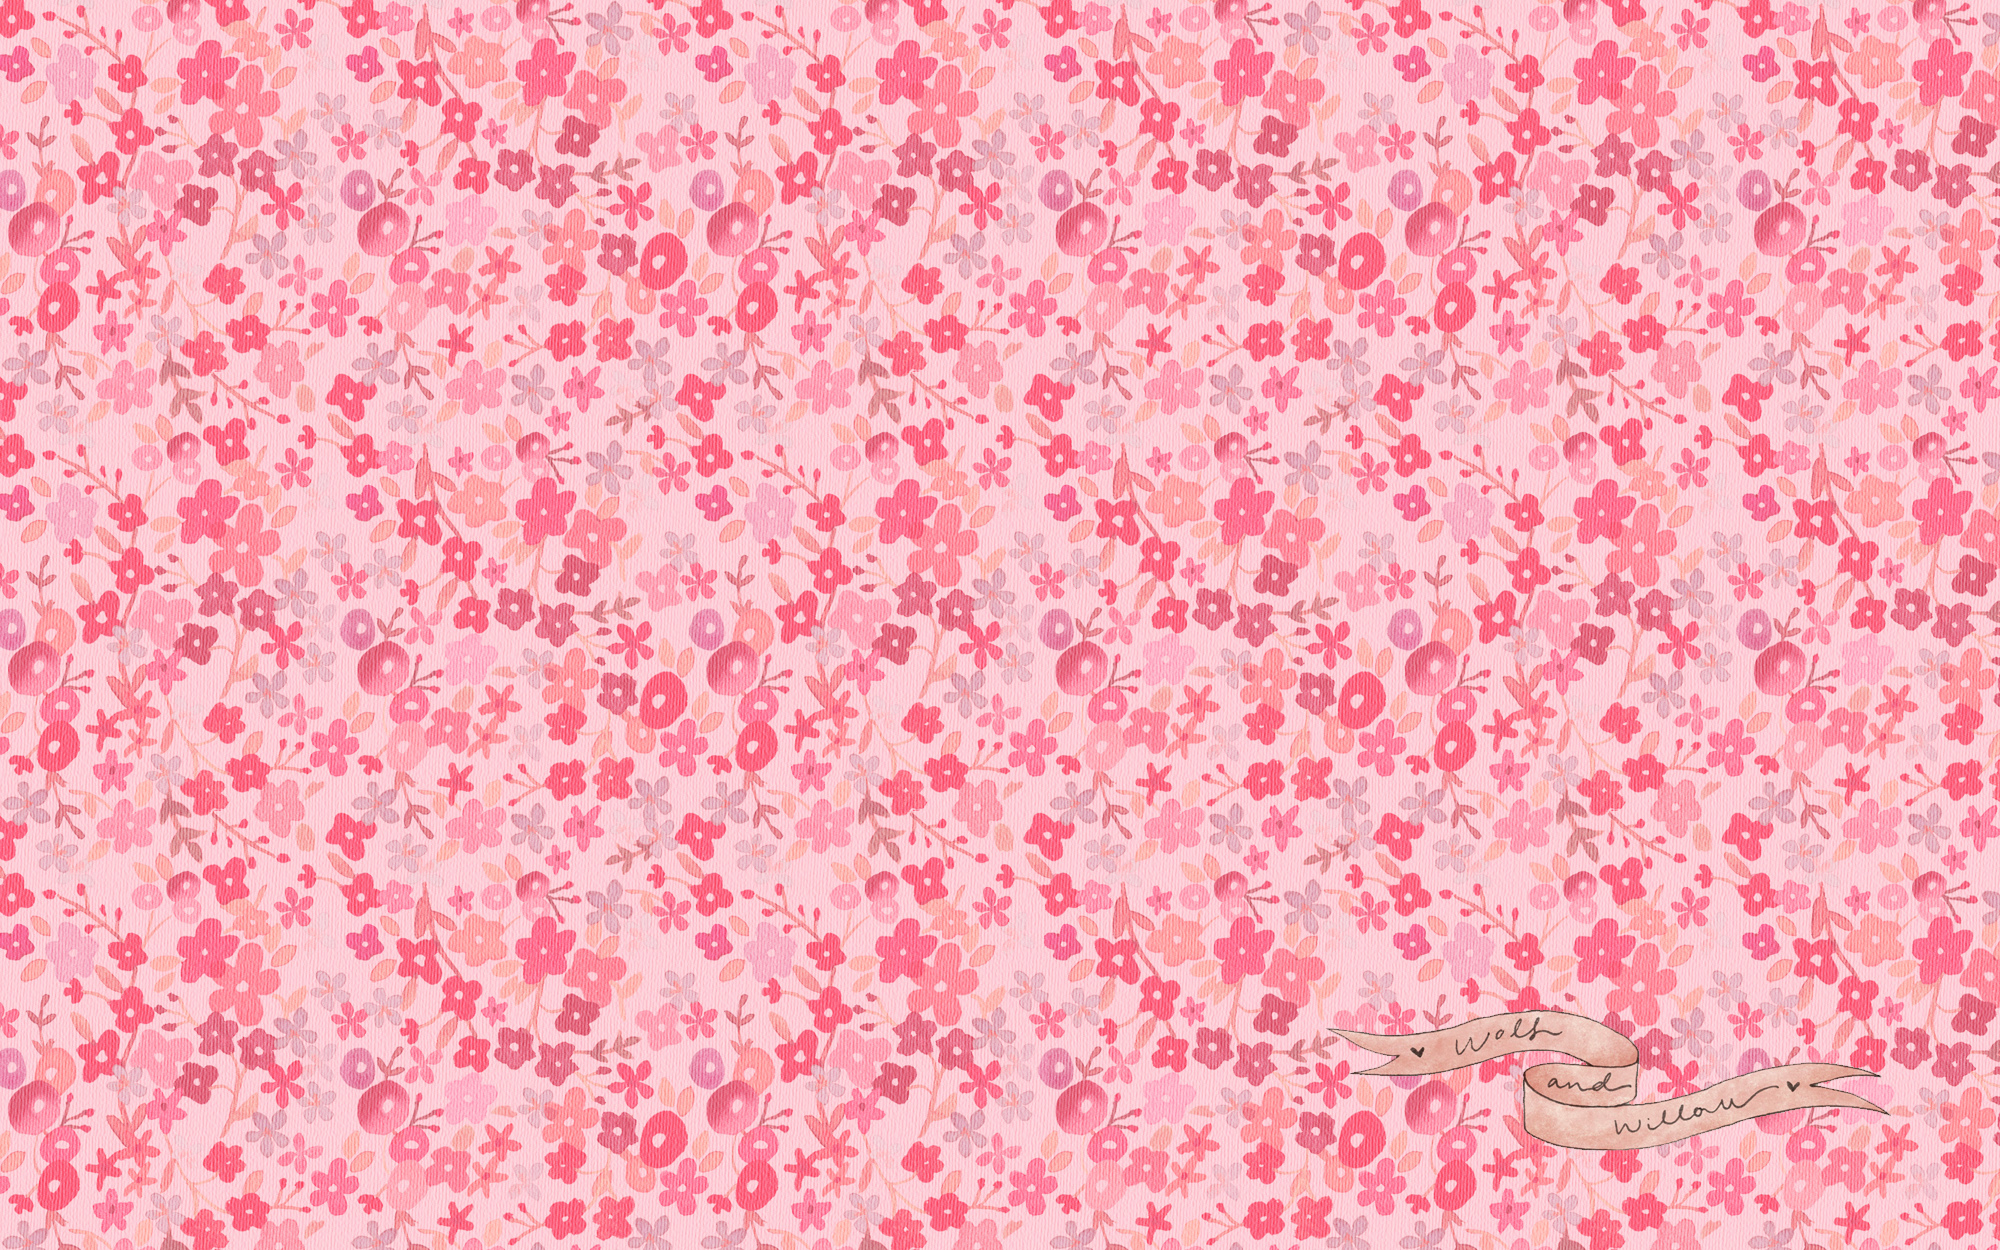 Flowers Floral Wallpaper Retro